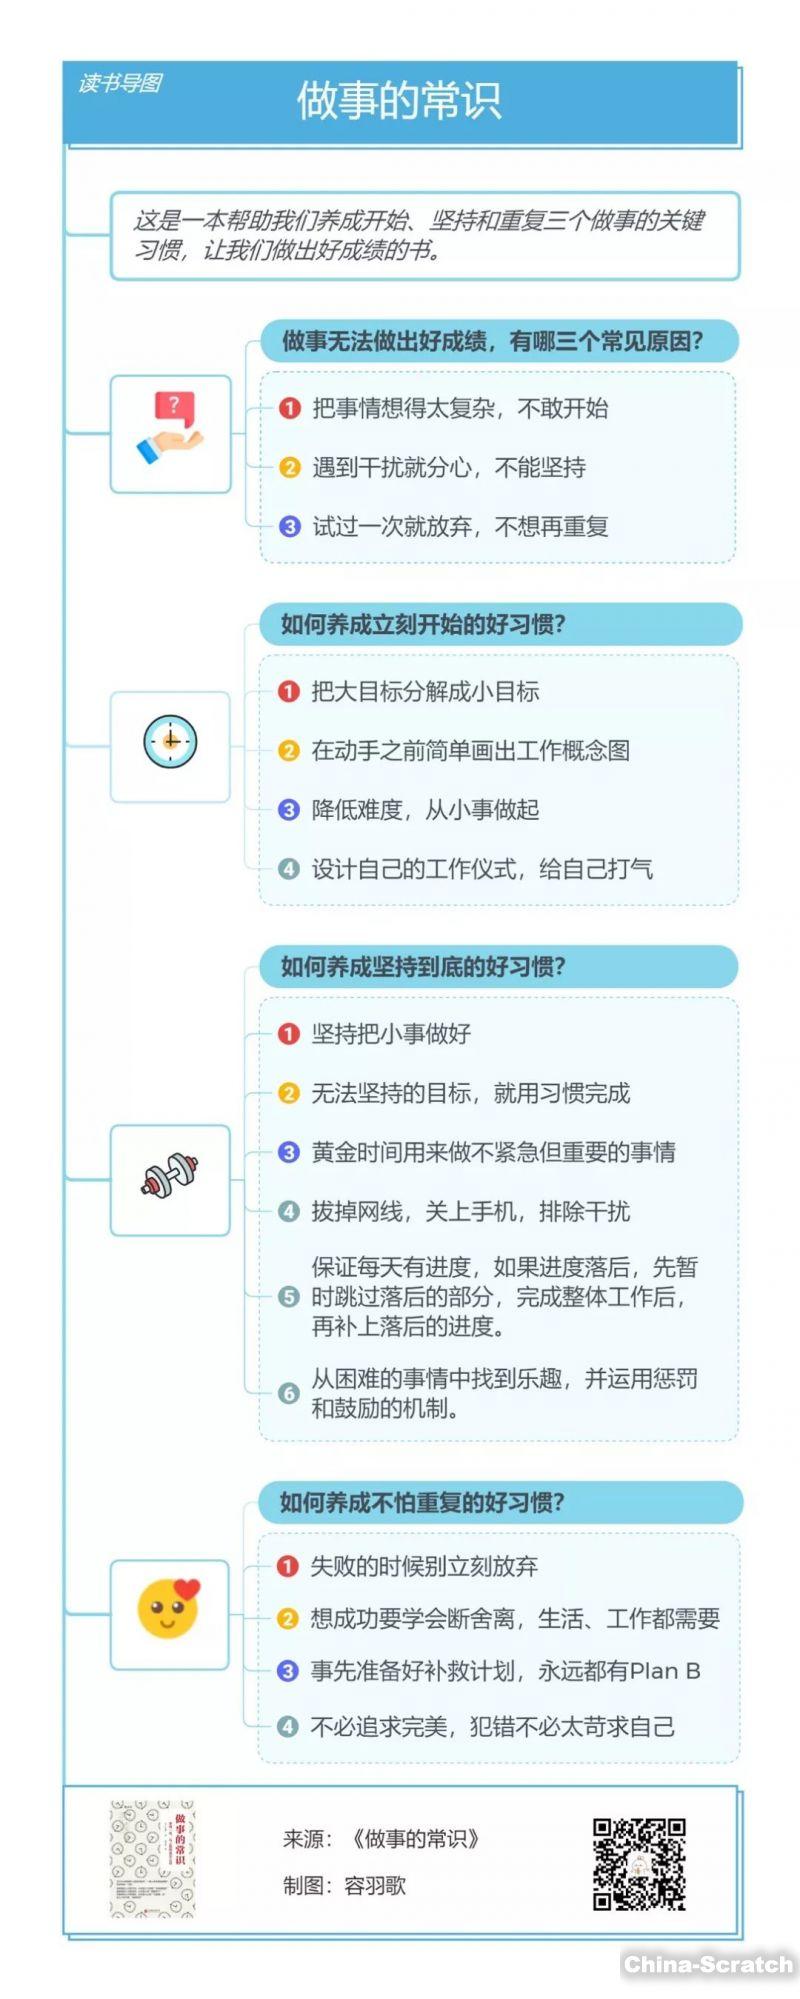 https://cdn.china-scratch.com/timg/191022/145K0J03-3.jpg